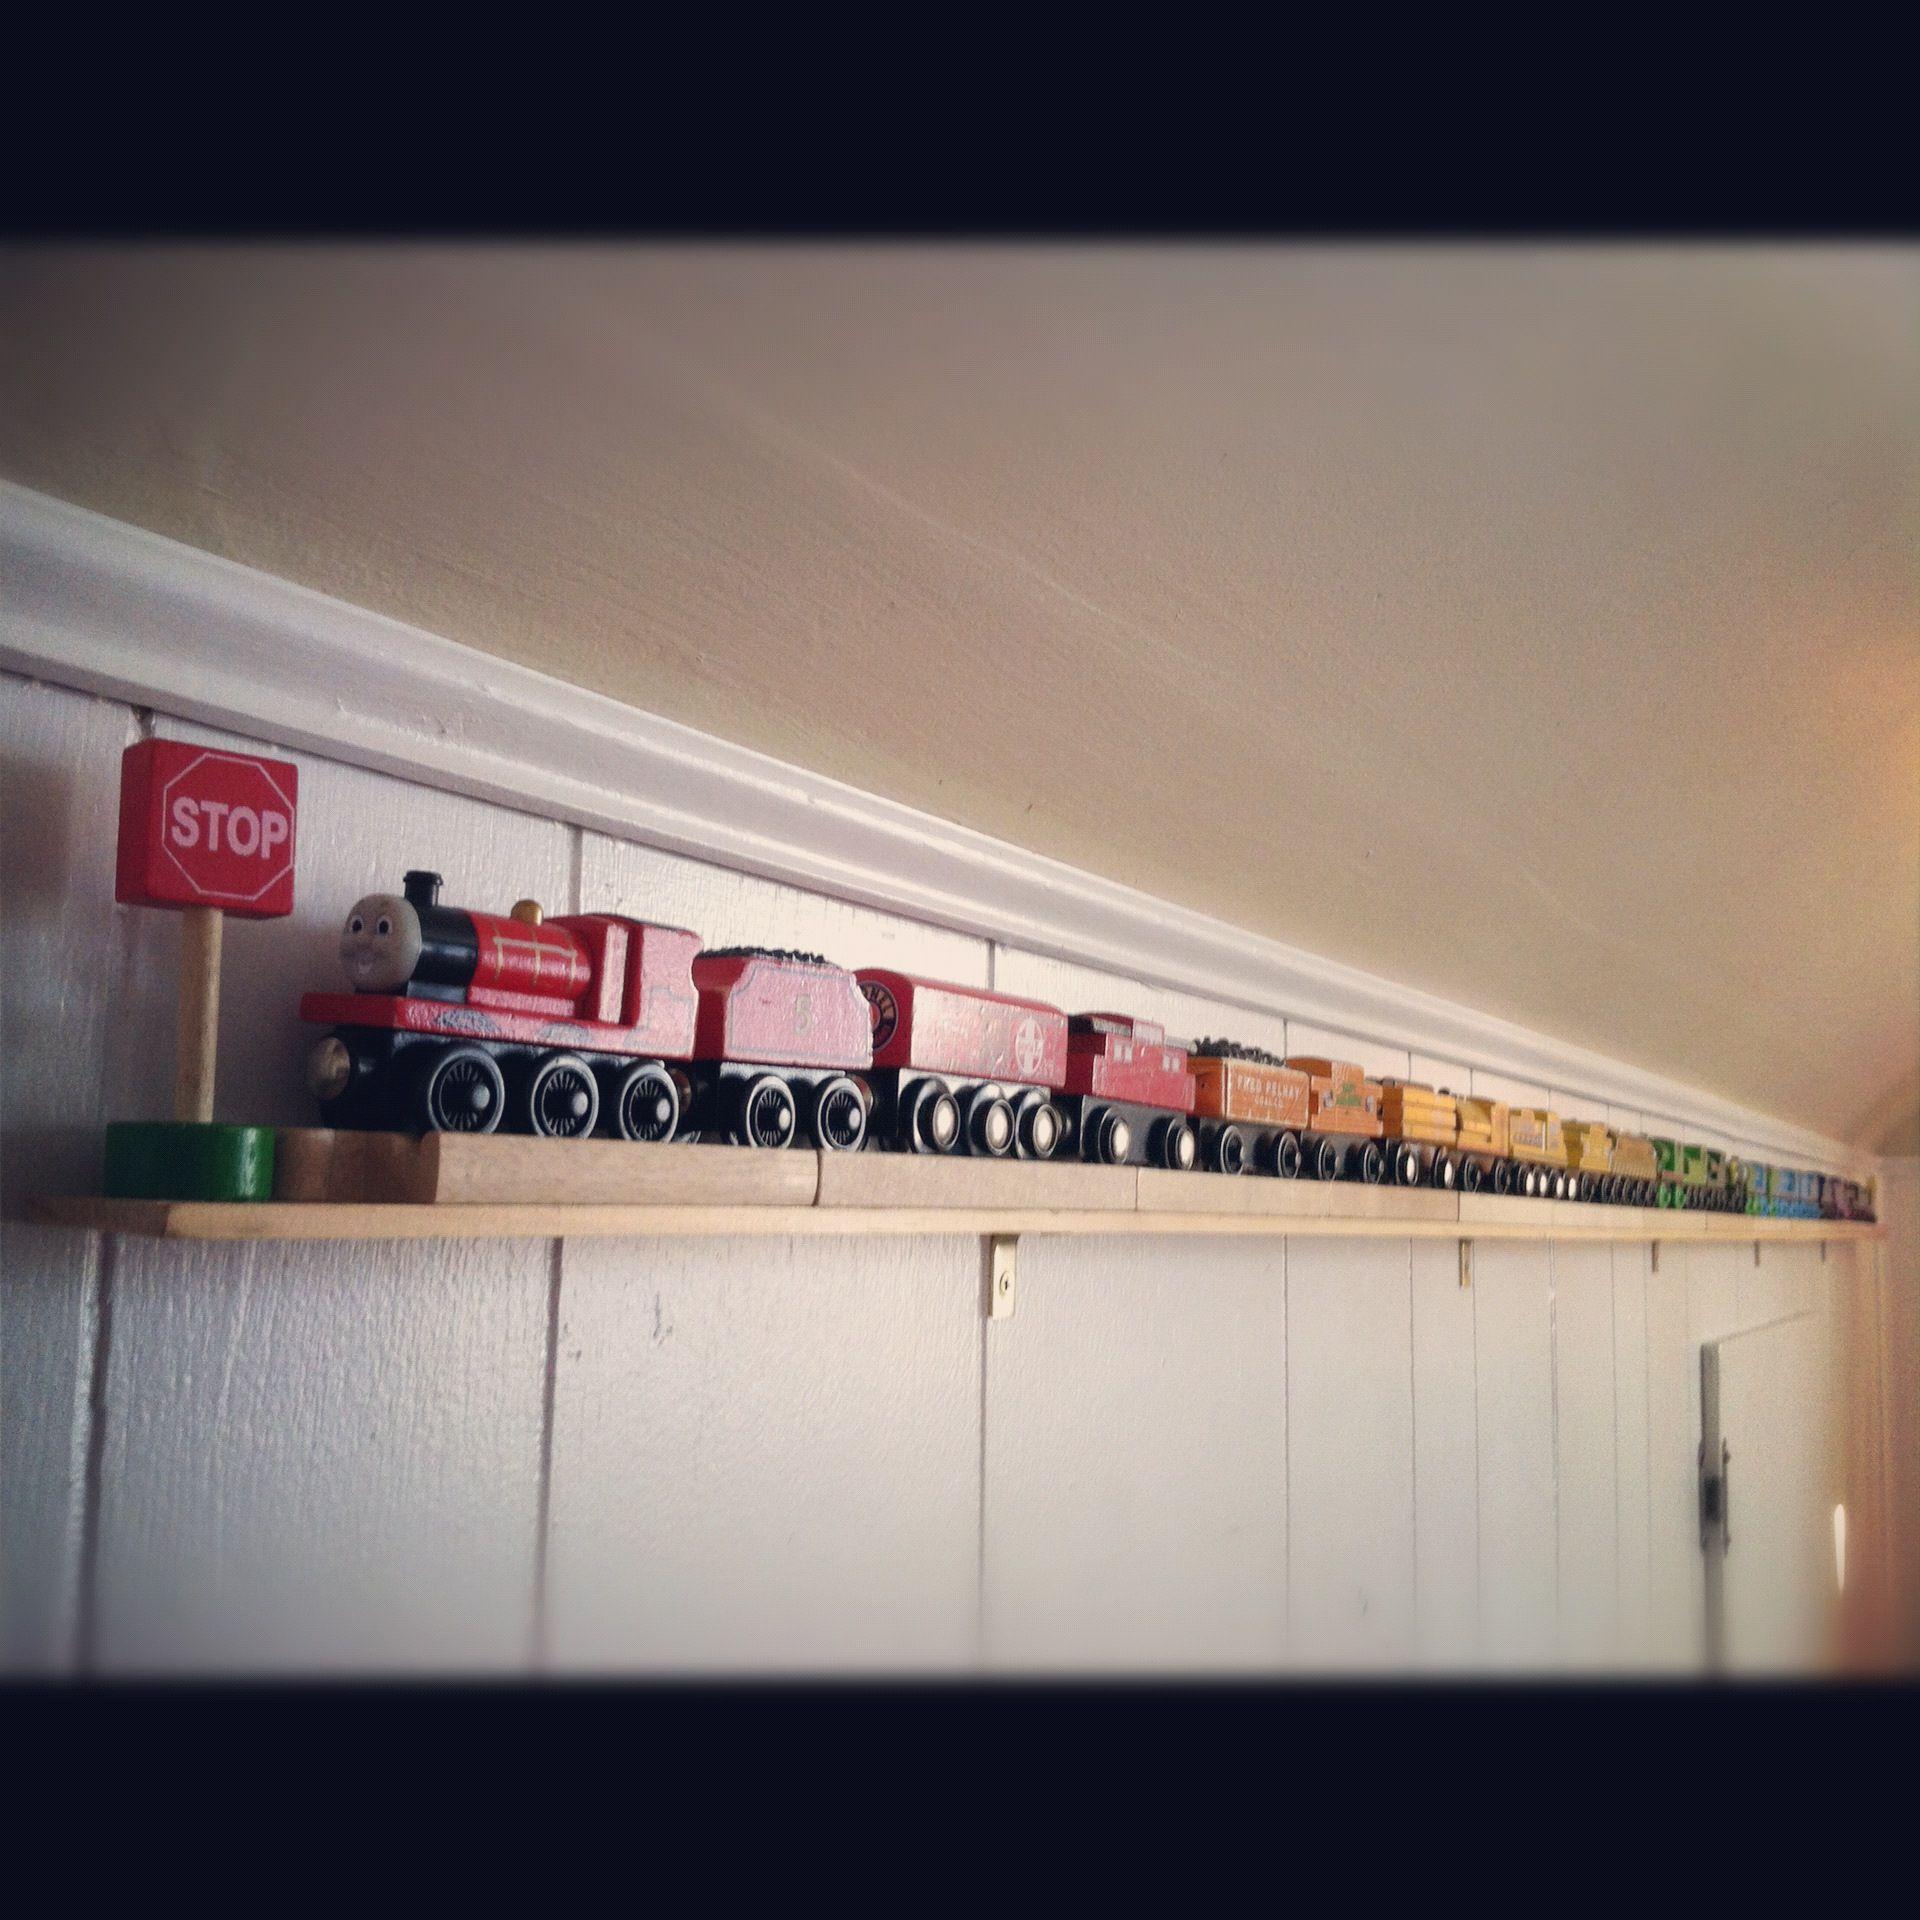 watch train youtube hqdefault davidson harley ceiling shelf